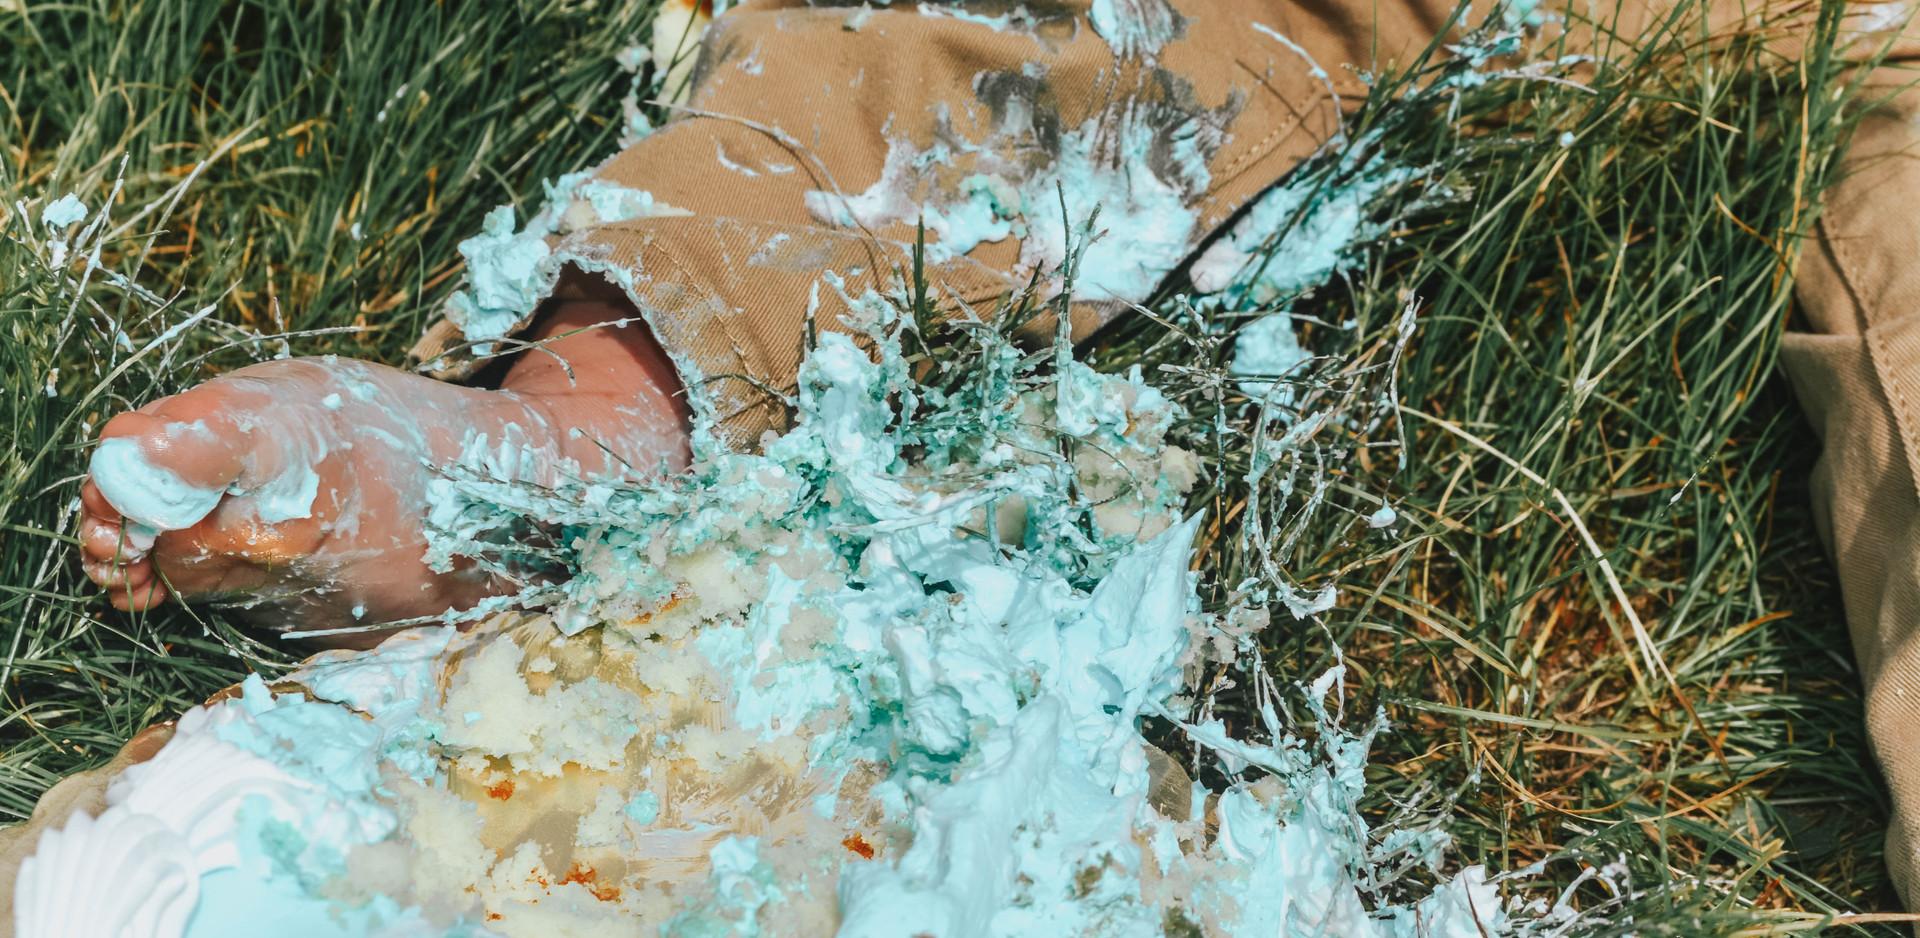 social media, content, photography, photographer, portrait, portrait photography, portrait photographer, beach, beach portrait, beach session,  cape cod, boston, cape cod photography, cape cod photographer, boston photography, boston photographer, summer, cape cod summer, baby portrait, baby photography, baby photographer, cake smash, baby, baby cake smash, summer baby, one year, one year old, one year portraits, kingston photography, kingston photographer, kingston portraits, kingston baby, kingston cake smash